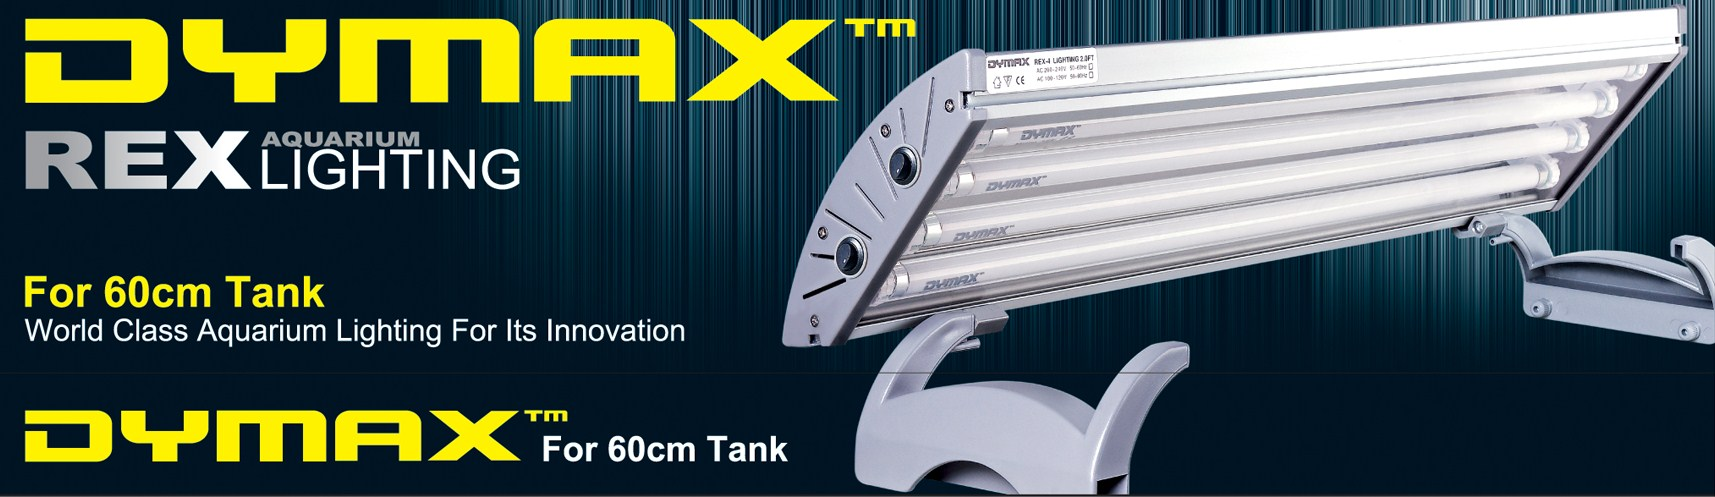 Dymax Luminária T5 Rex-4 (4X 14W) 80cm 110v